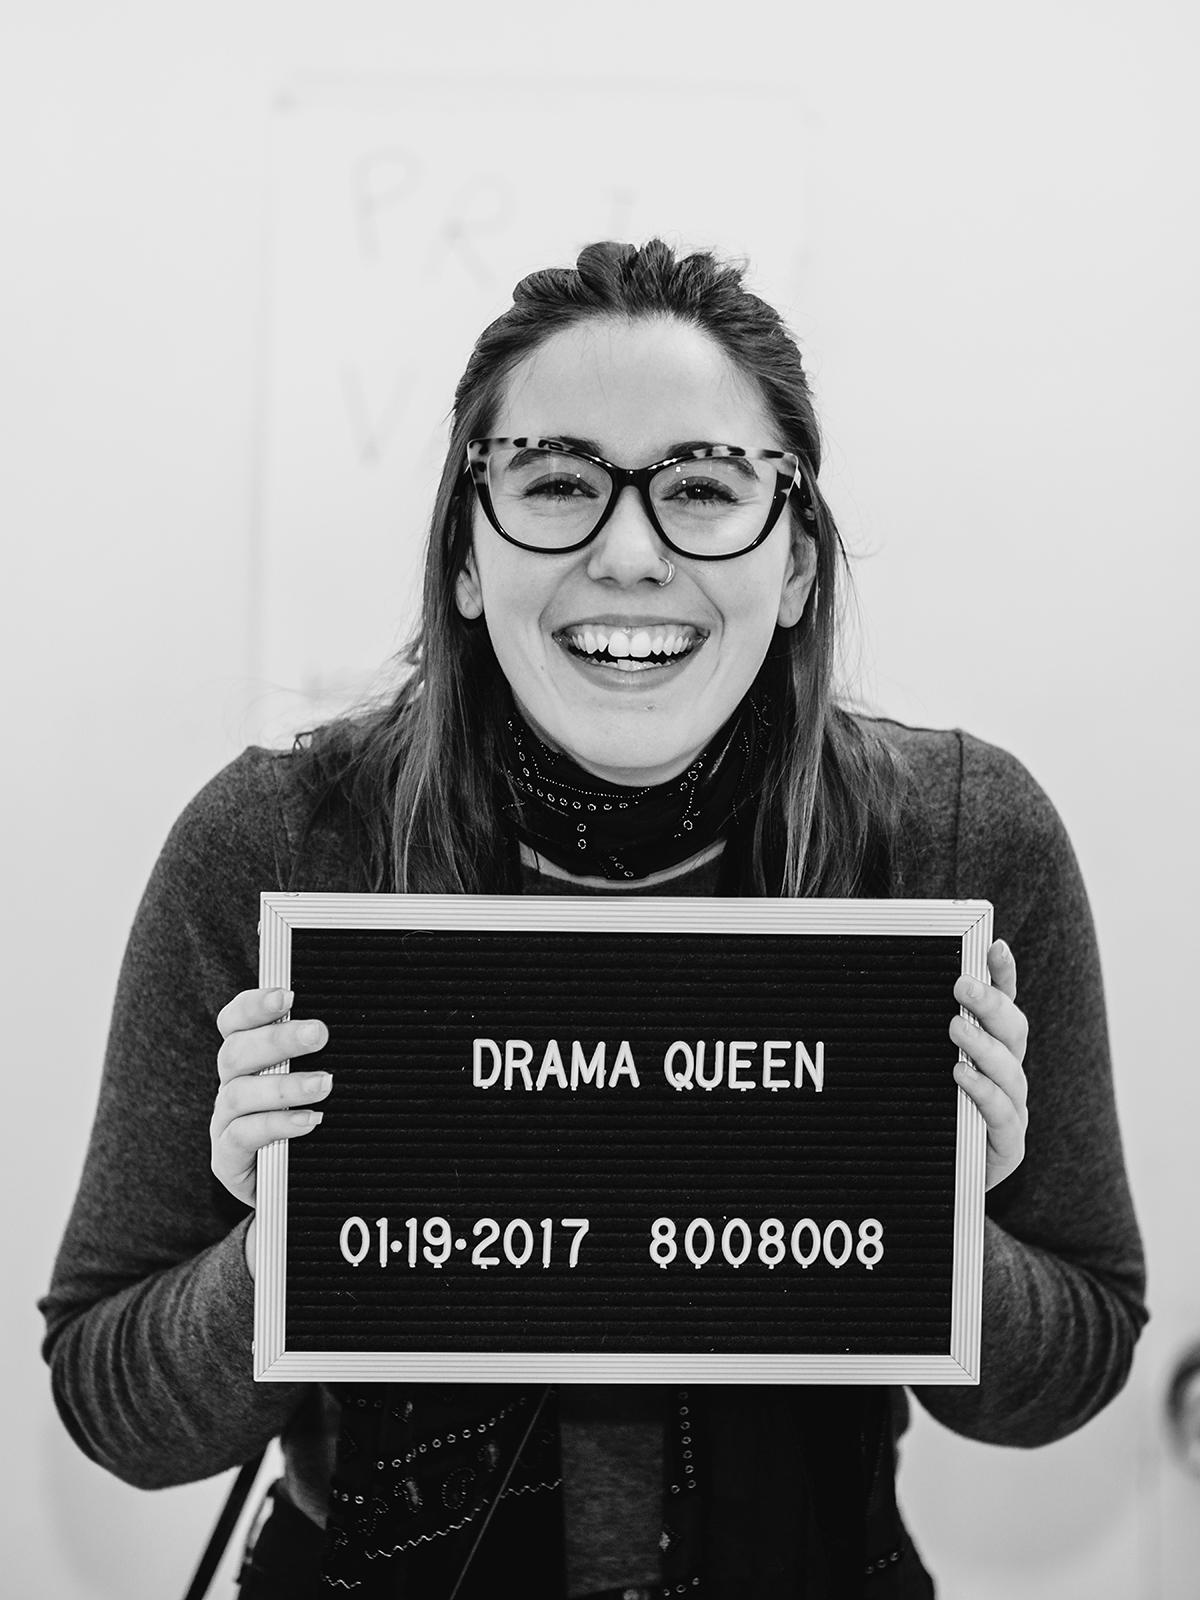 8008008 drama queen.jpg